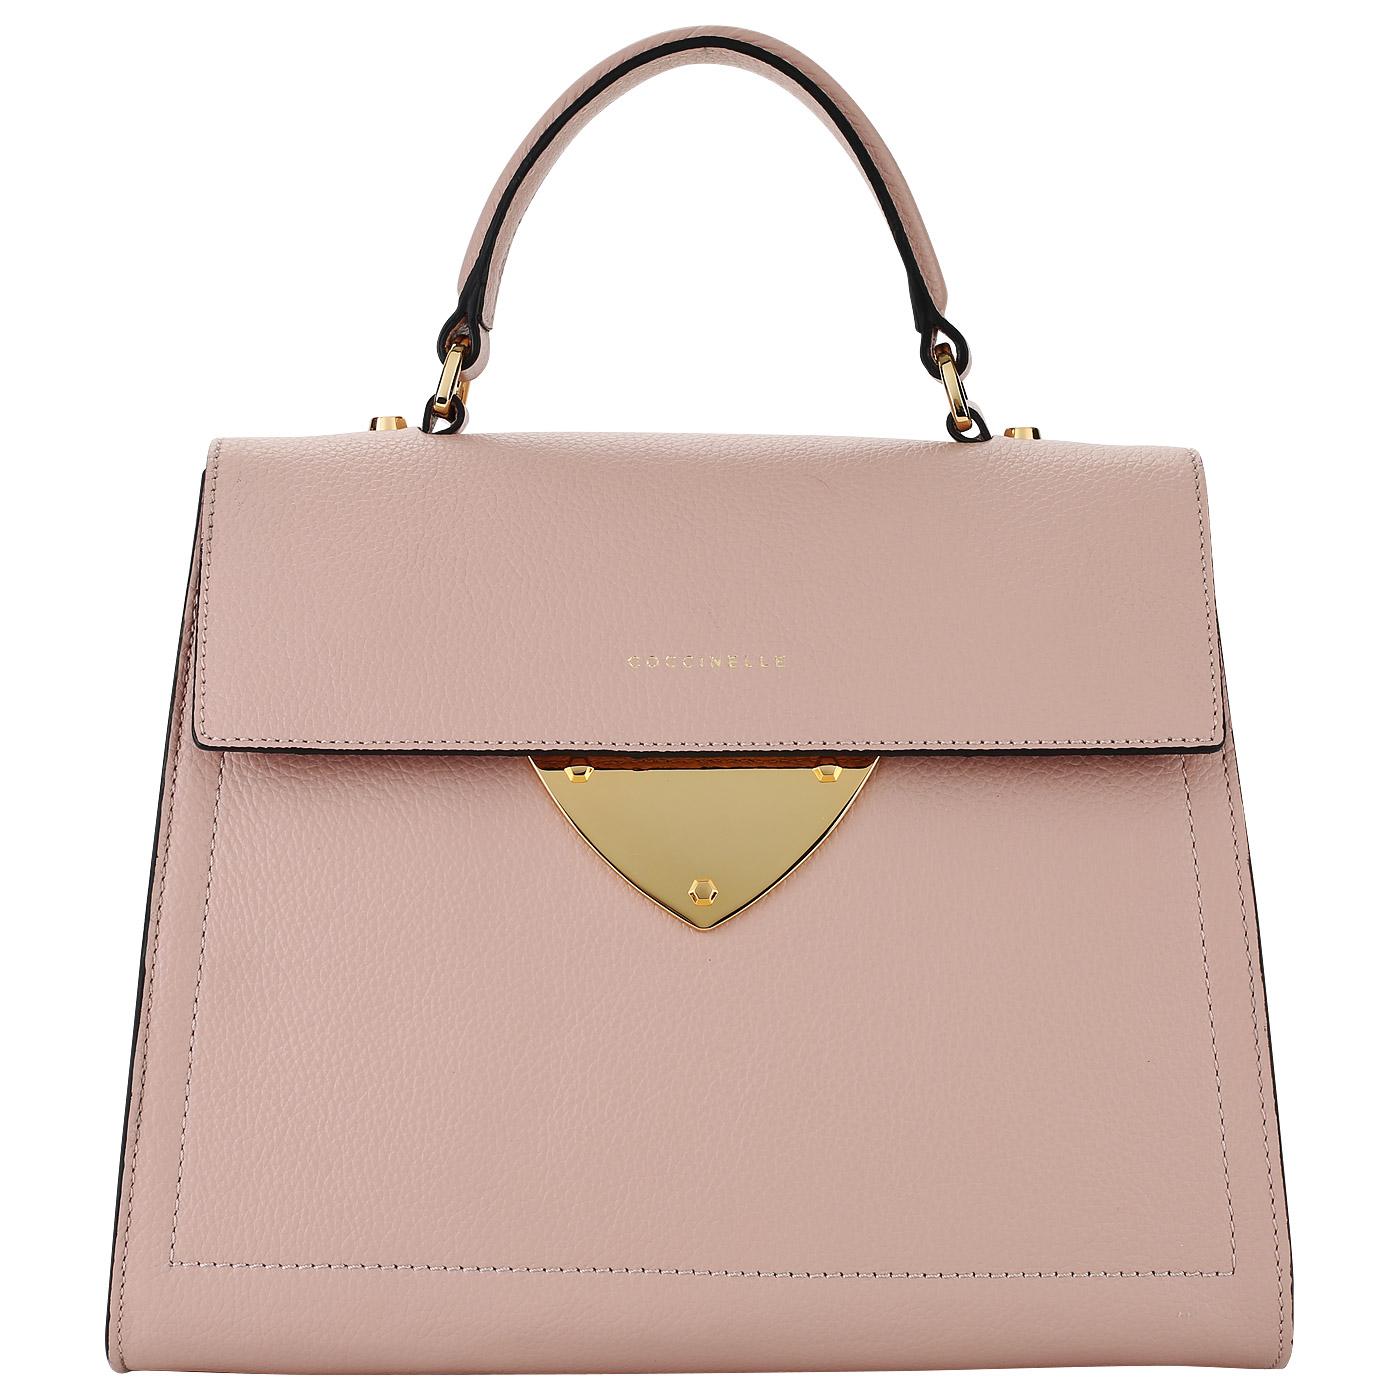 132b1283ace2 ... Женская классическая сумка из кожи Coccinelle B14 Lunar new year ...